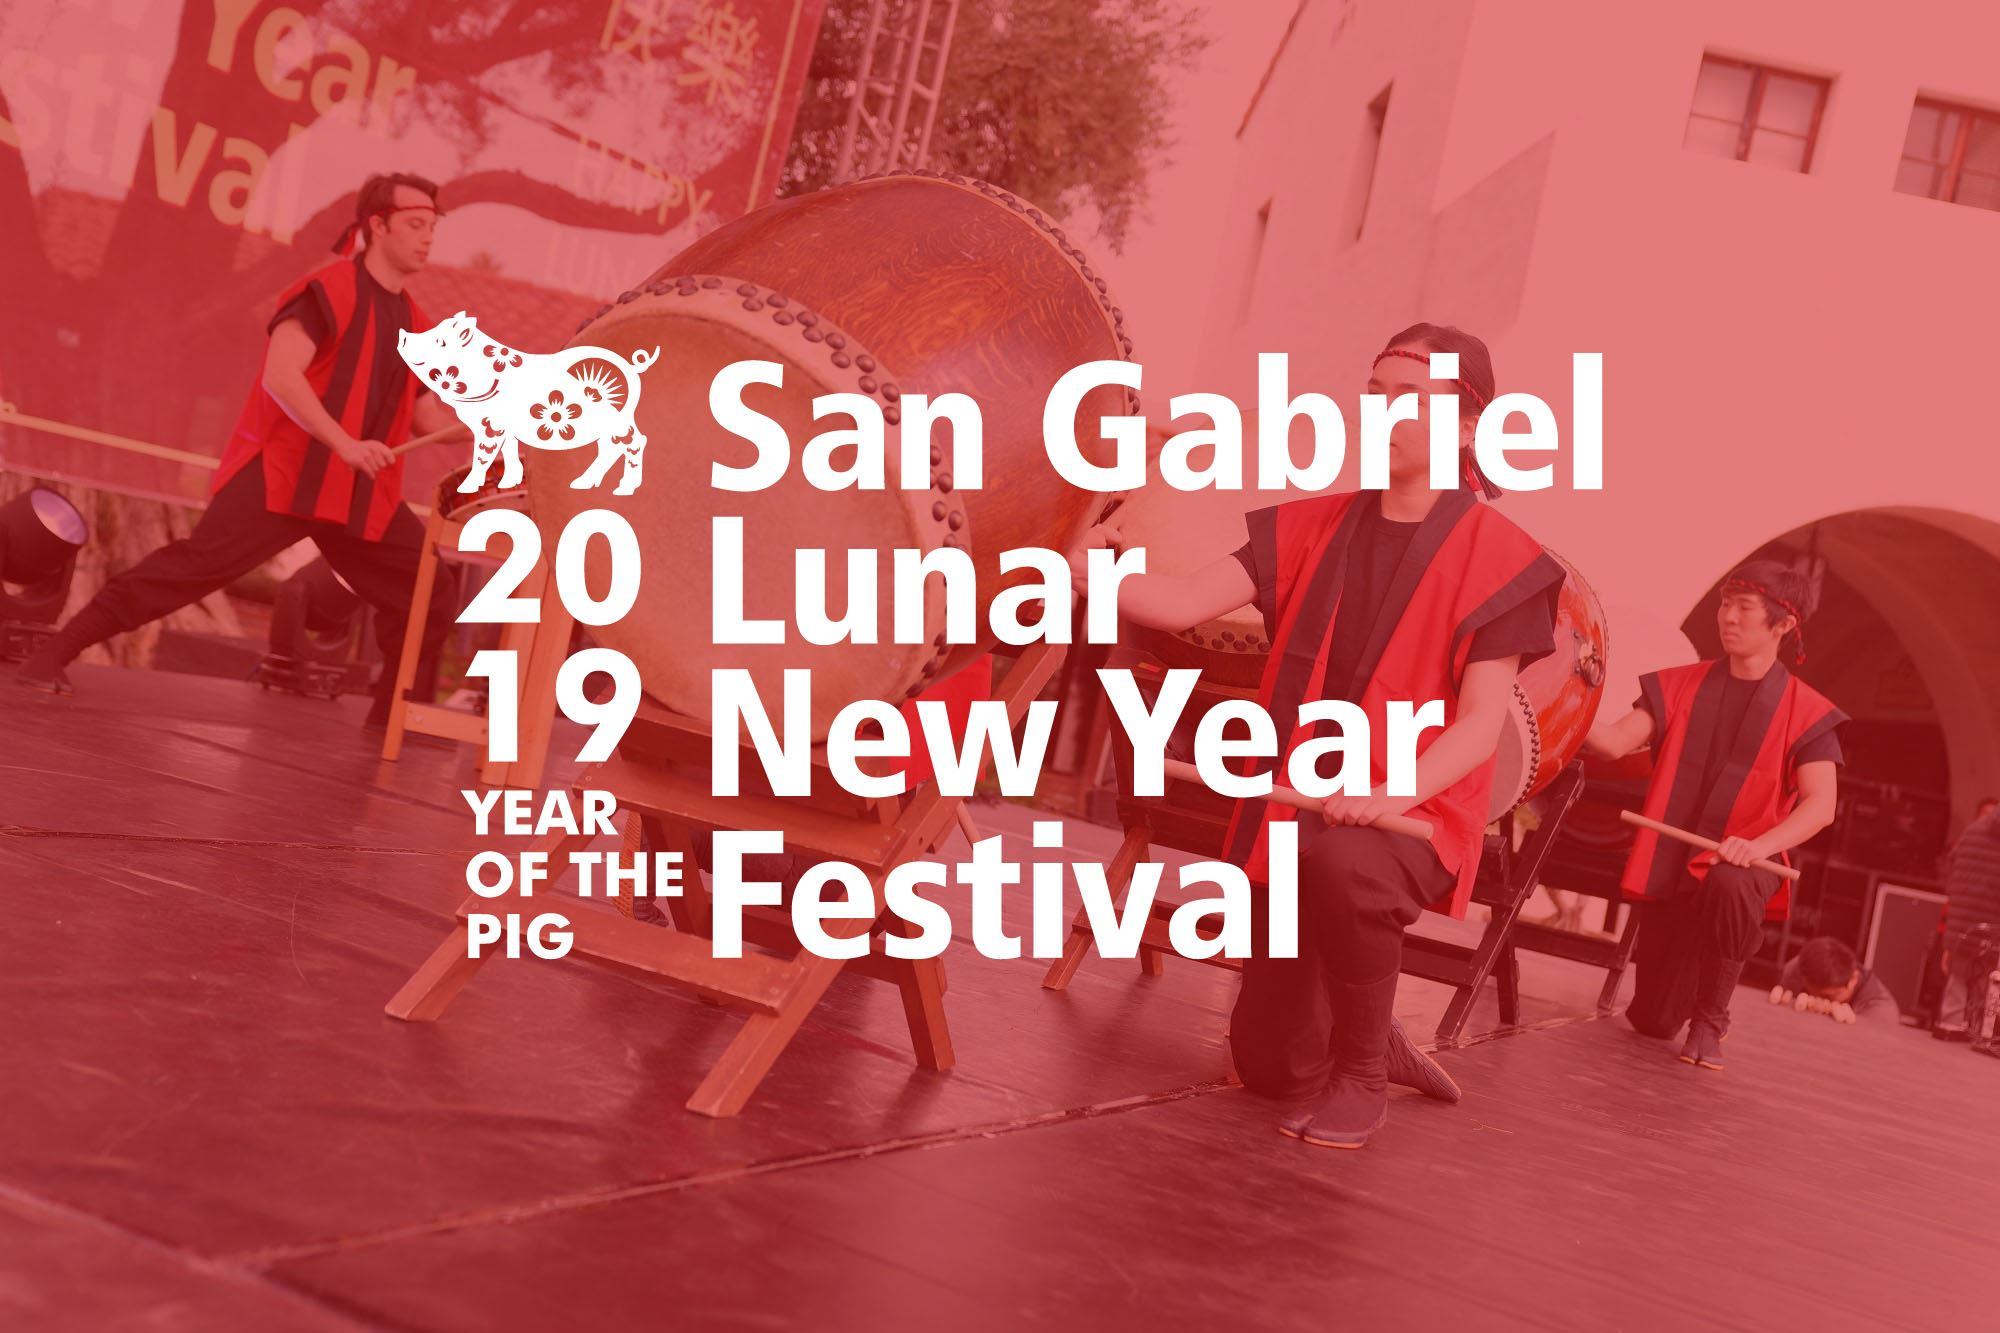 San Gabriel Lunar New Year Festival 2019 San Gabriel, CA   Official Website